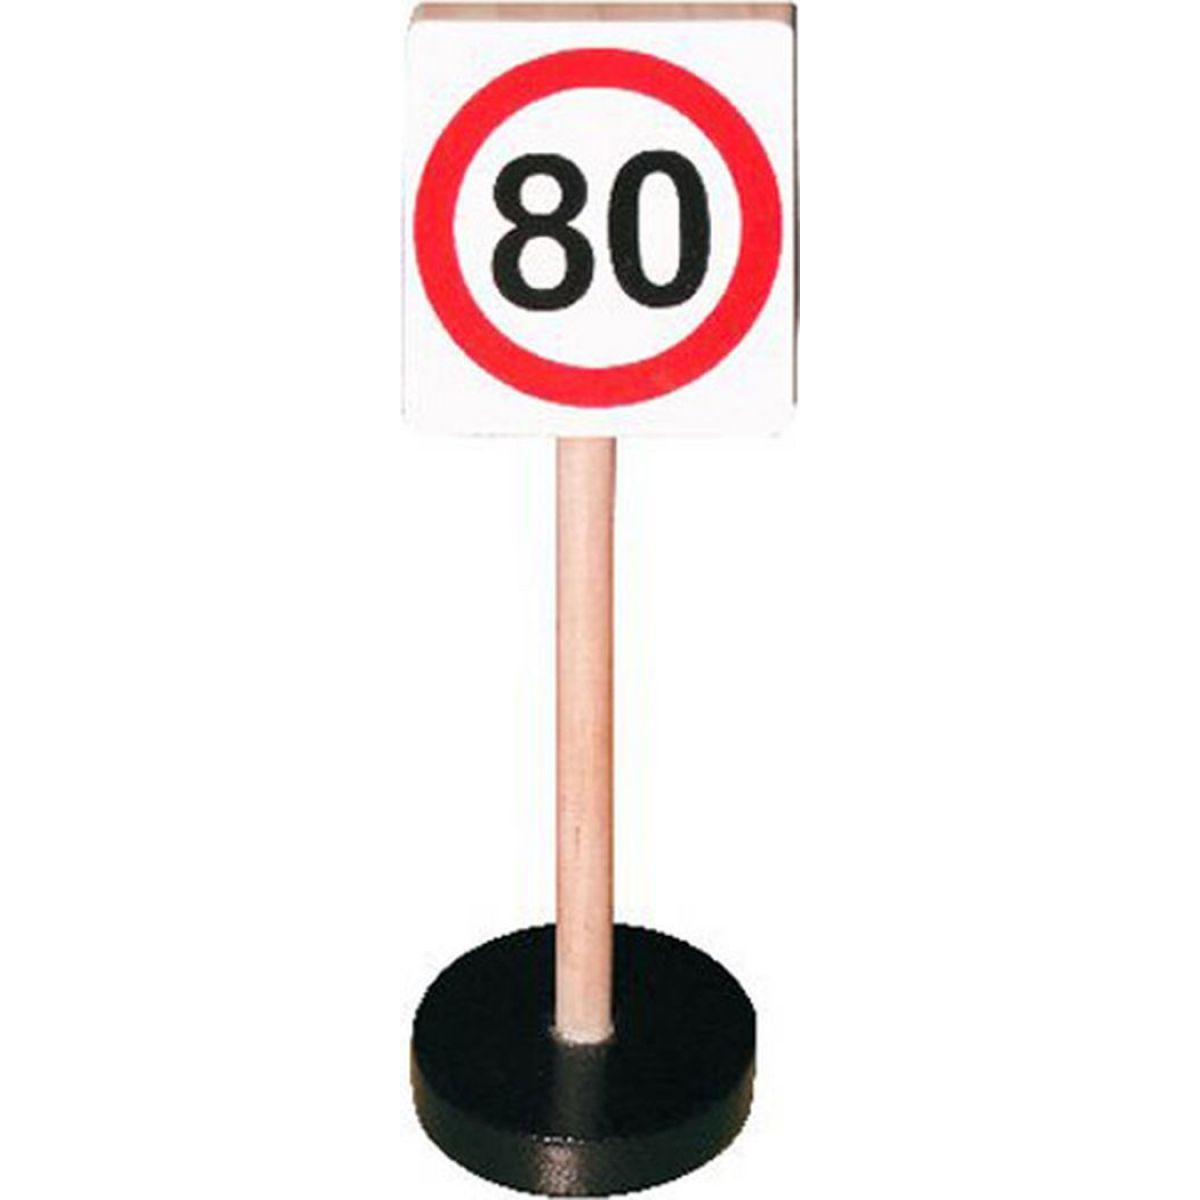 Studo Wood Značka Max rychlost 80 km